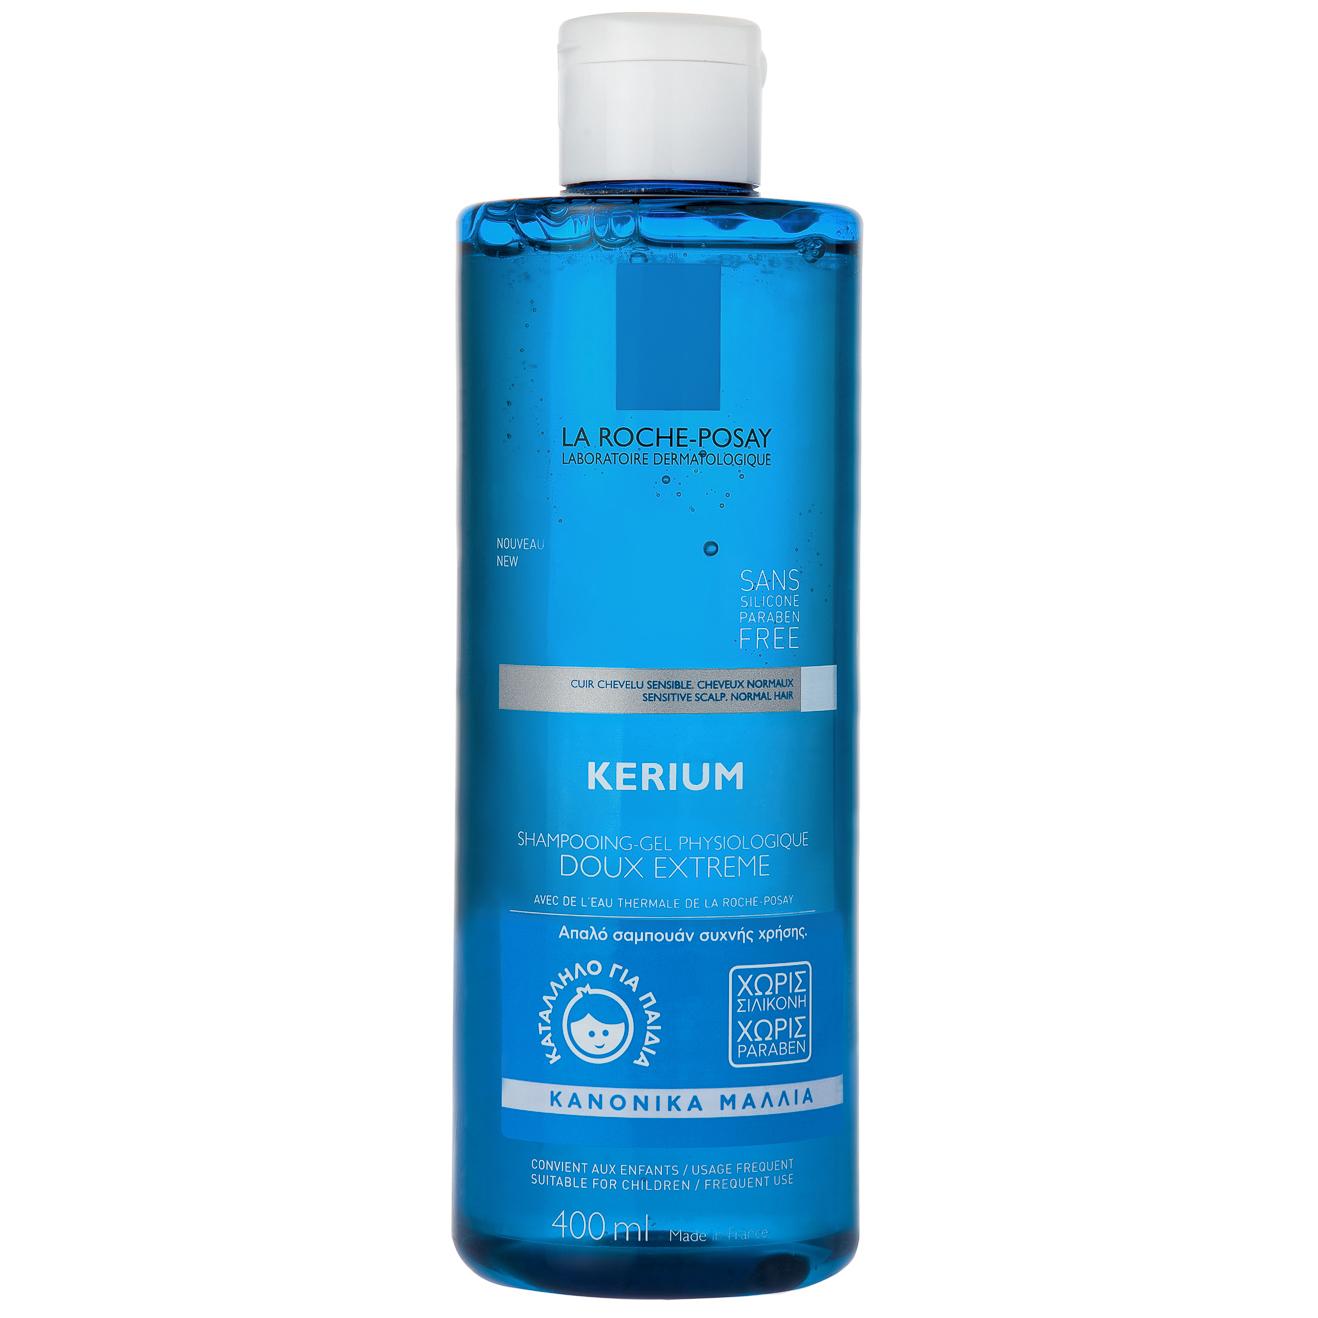 LA ROCHE POSAY Kerium Doux Extreme Gel Shampoo Για Κανονικά Μαλλιά 400ml